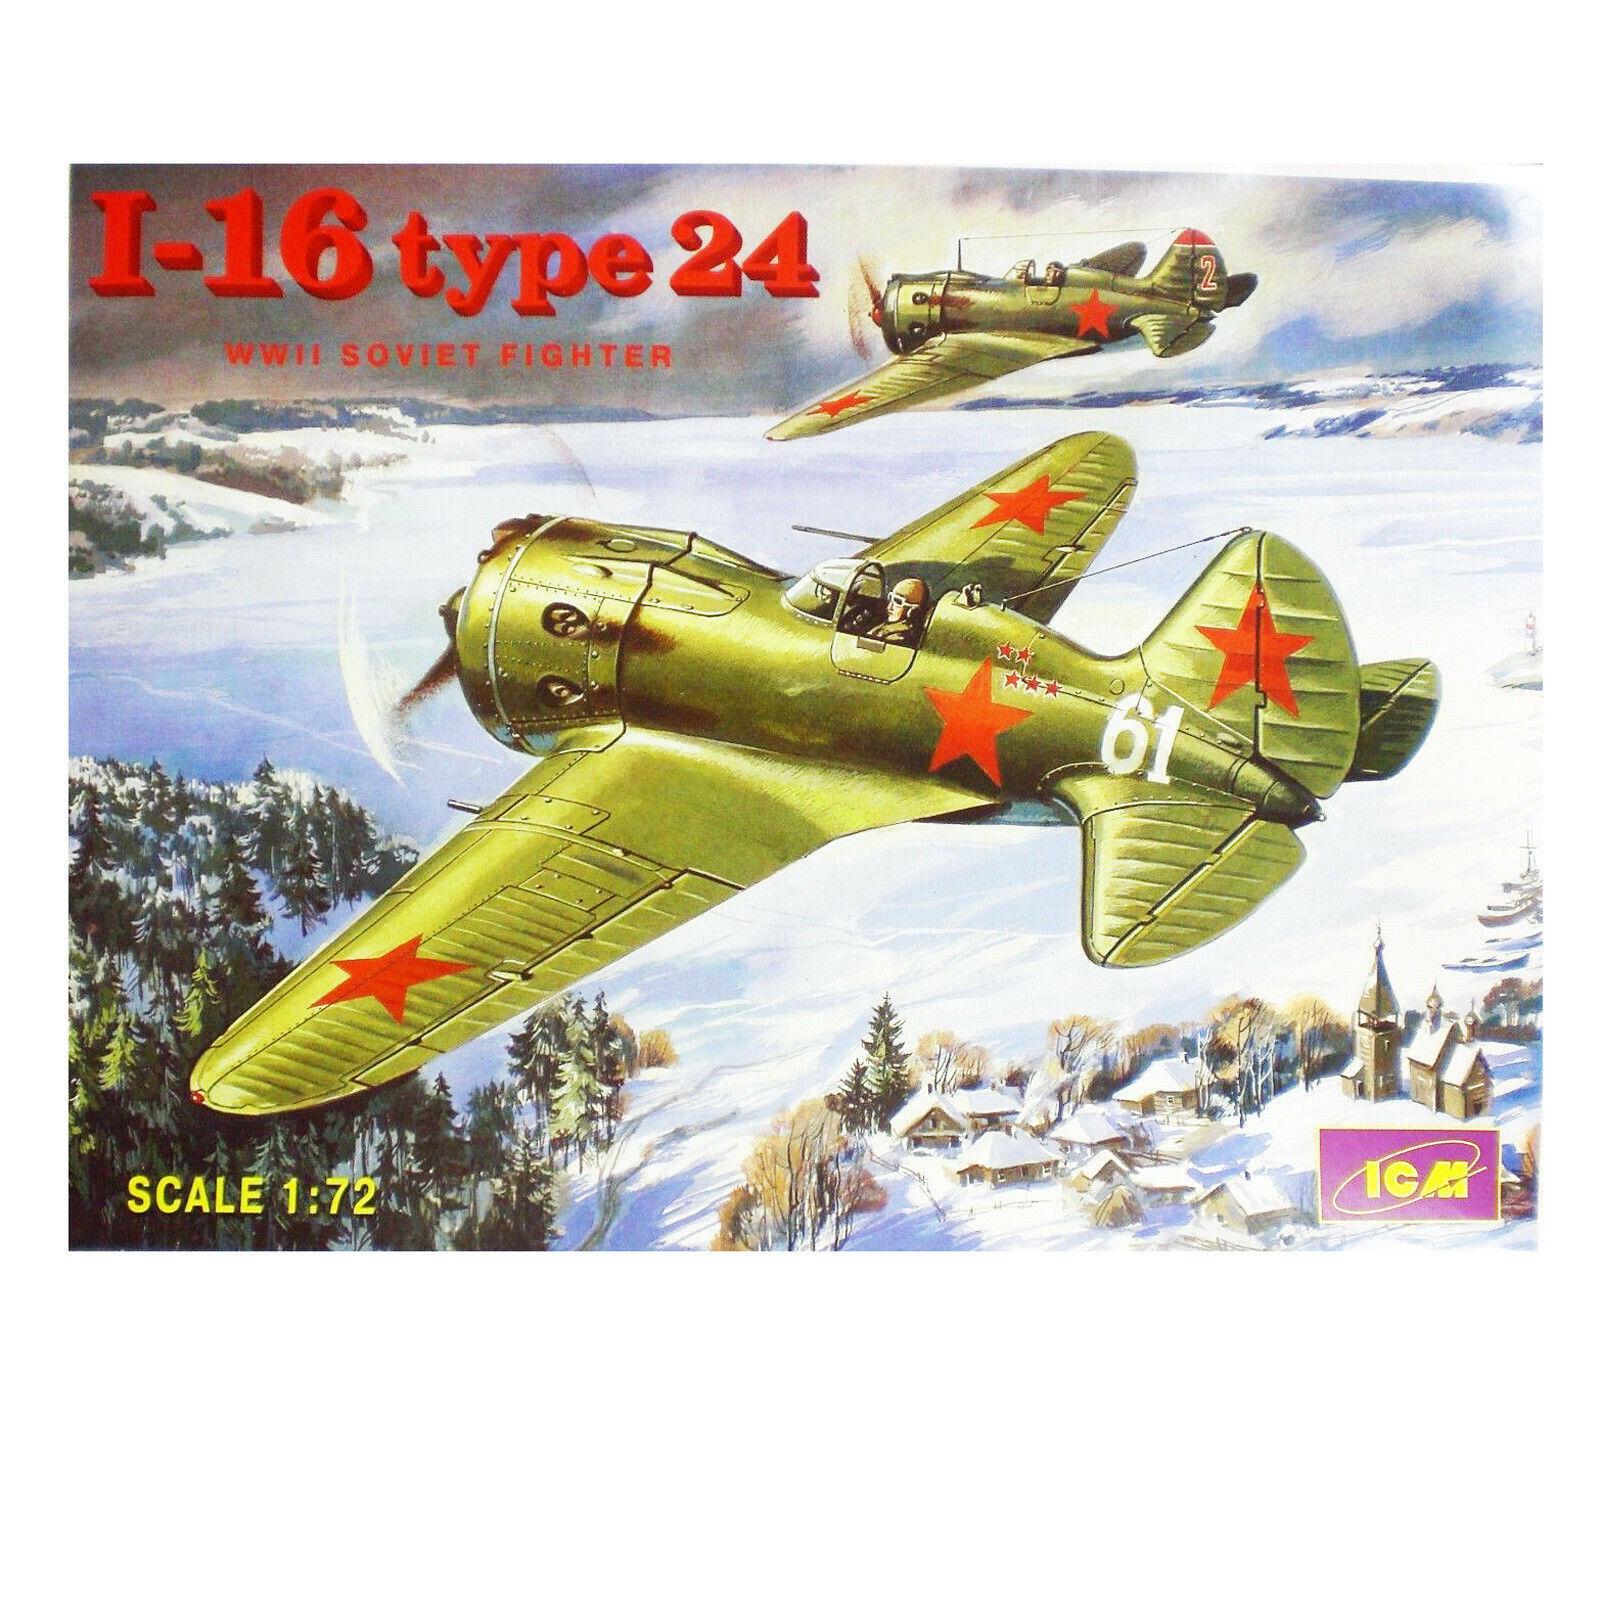 ICM 72073 Polikarpov I-16 Typ 28 in 1:72